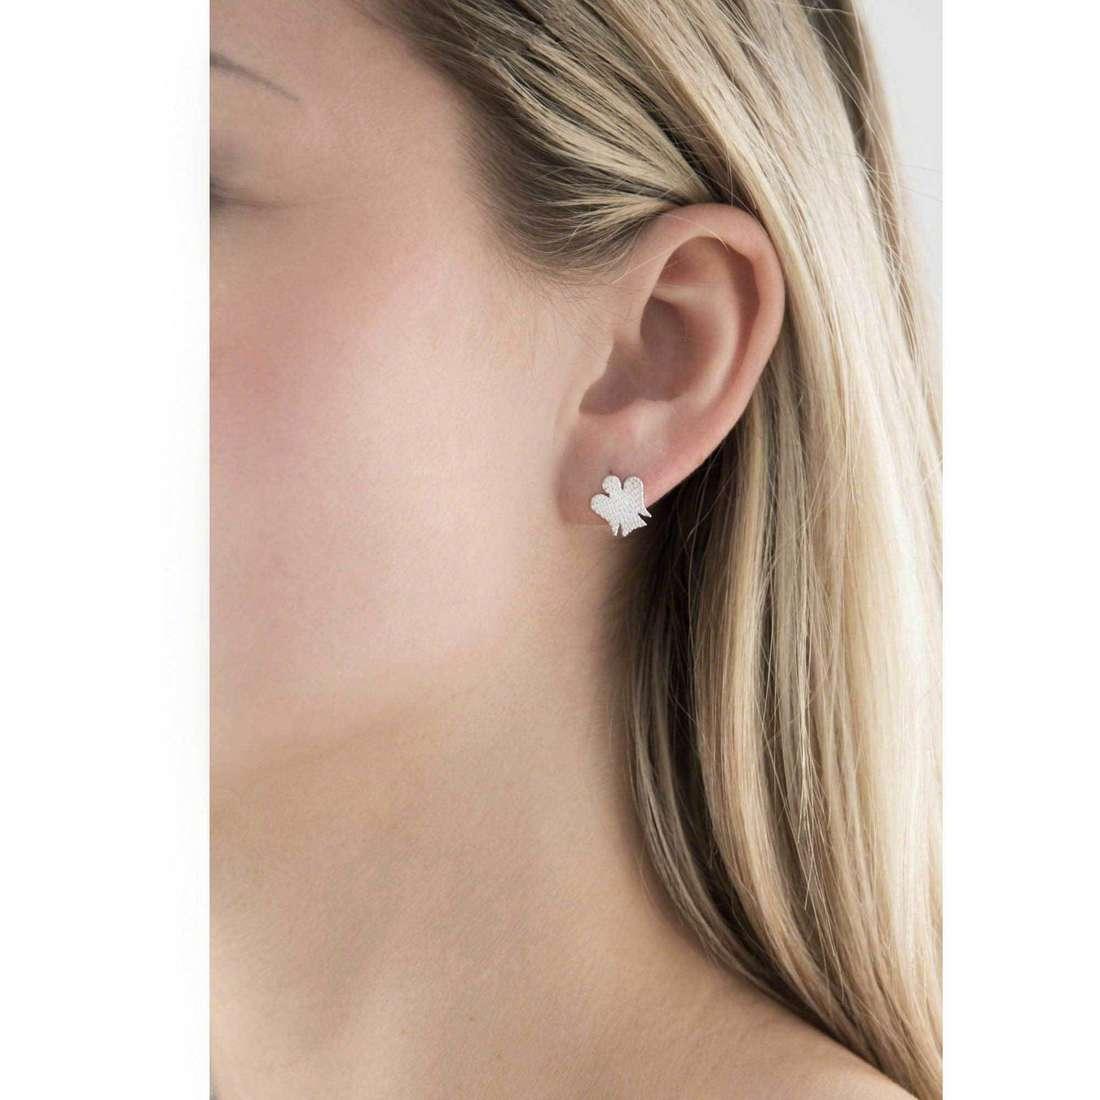 Giannotti orecchini donna GIA286 indosso